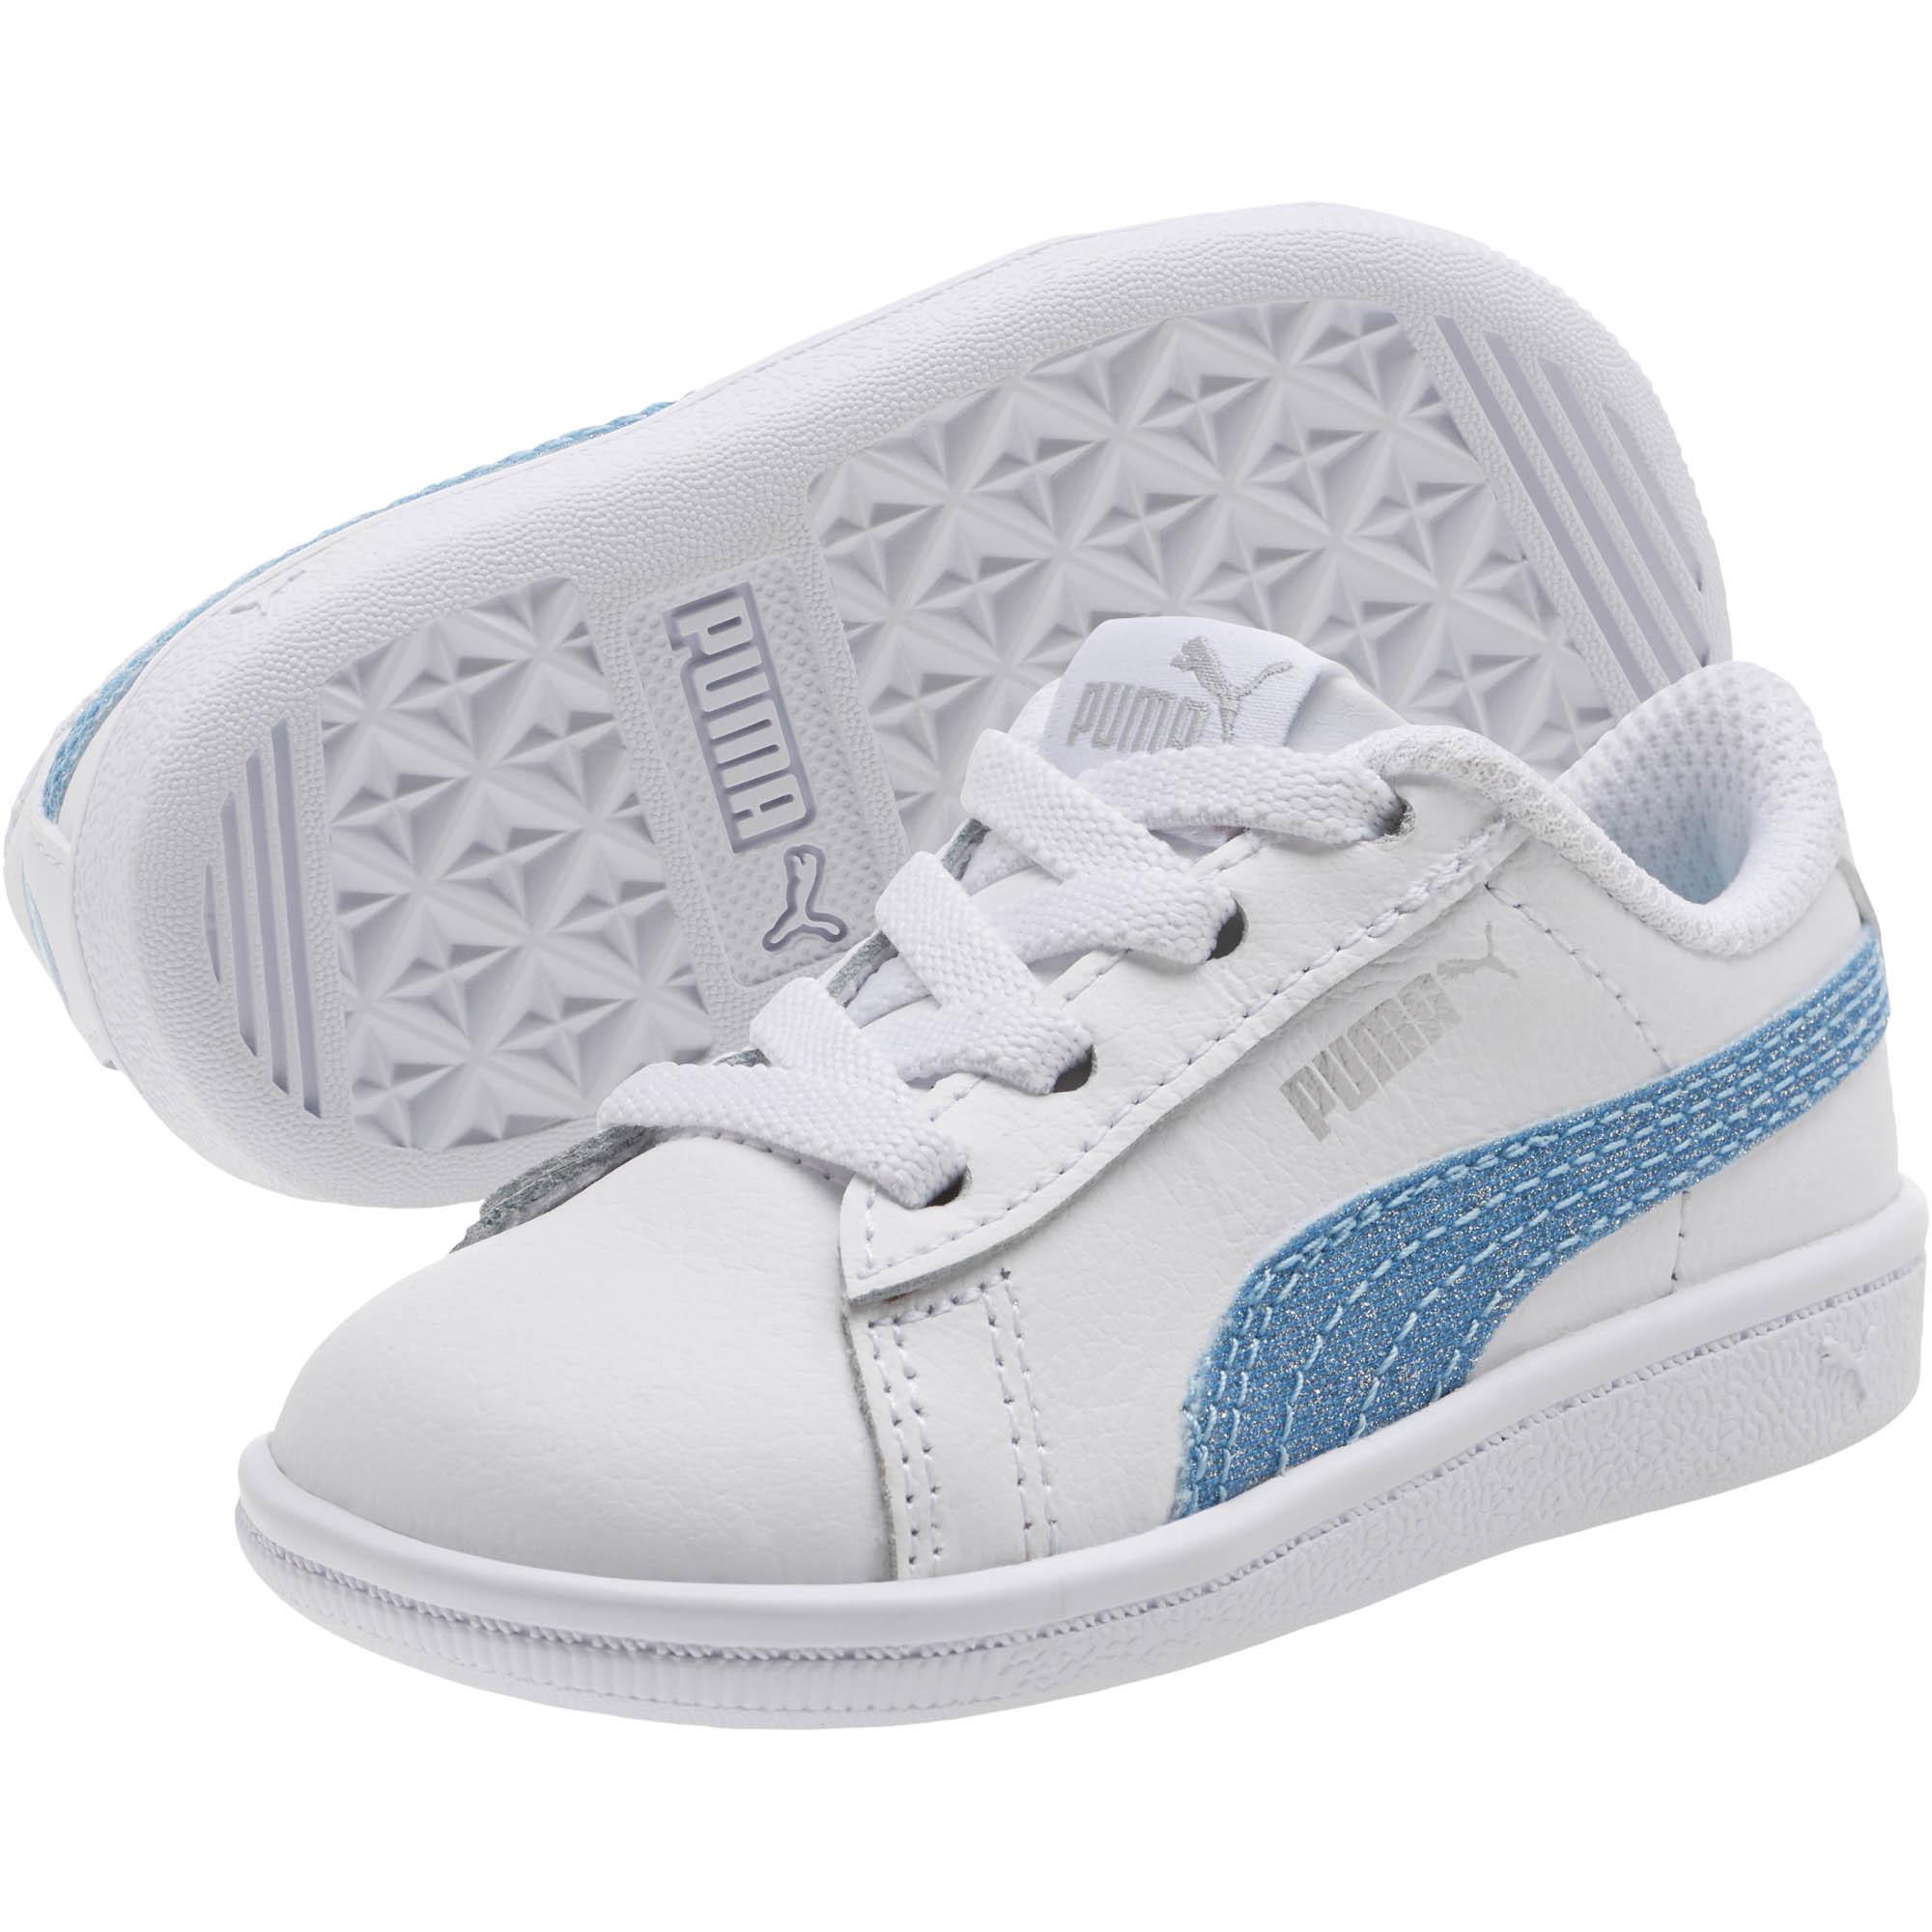 on sale 0eb83 53114 PUMA Puma Vikky Glitz FS AC Infant Sneakers Girls Shoe Kids 0